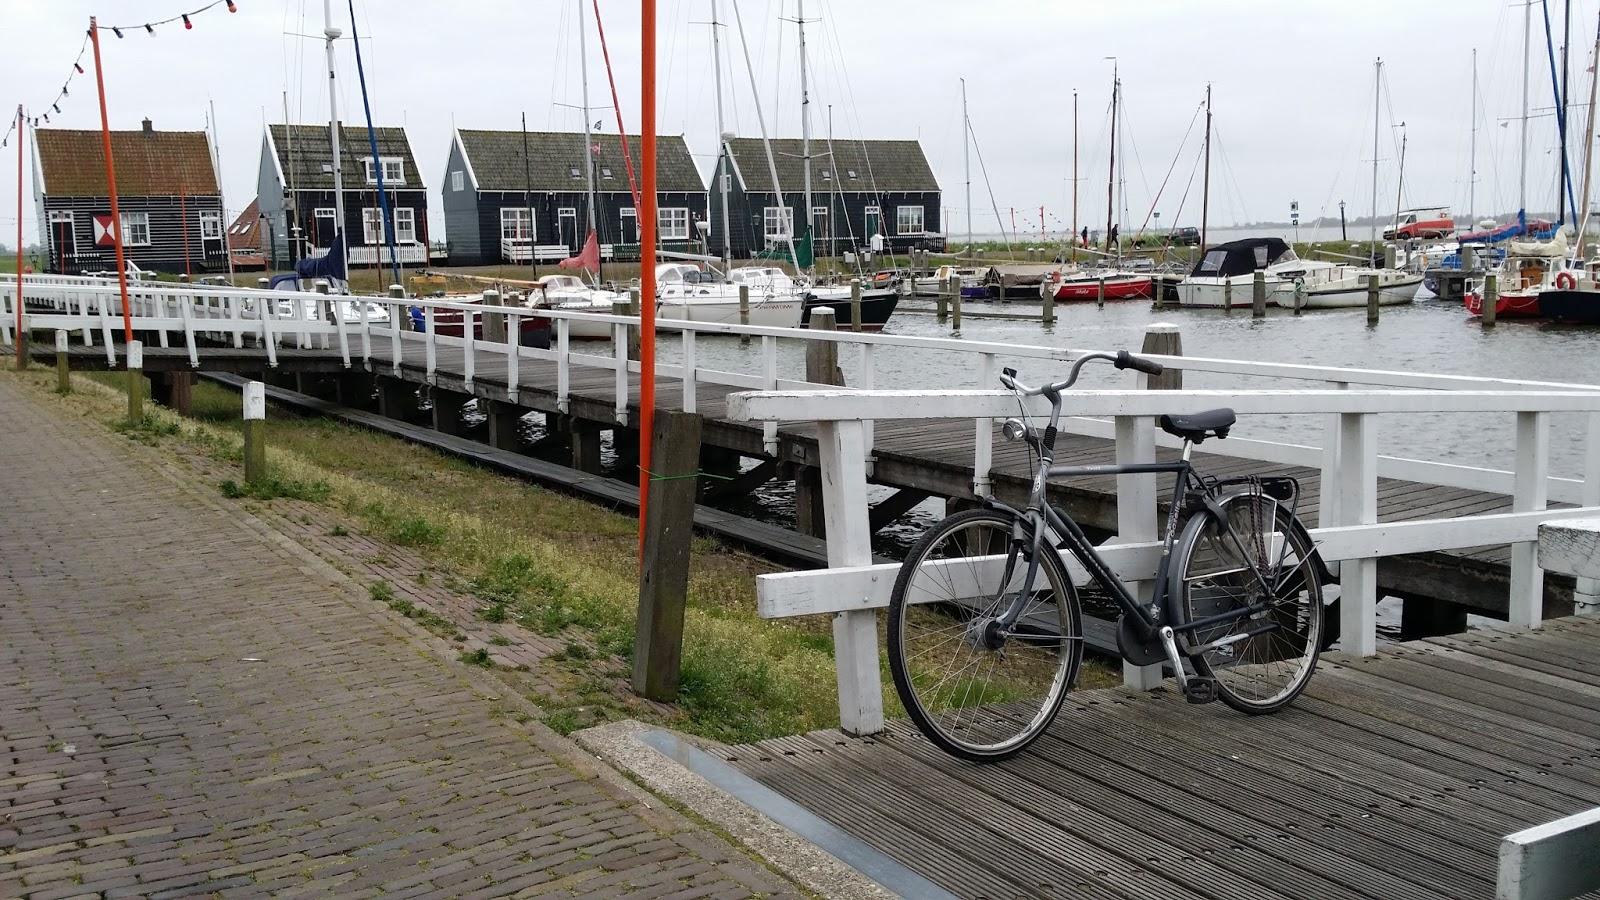 diseños por el mundo. Keukenhoff. Holanda